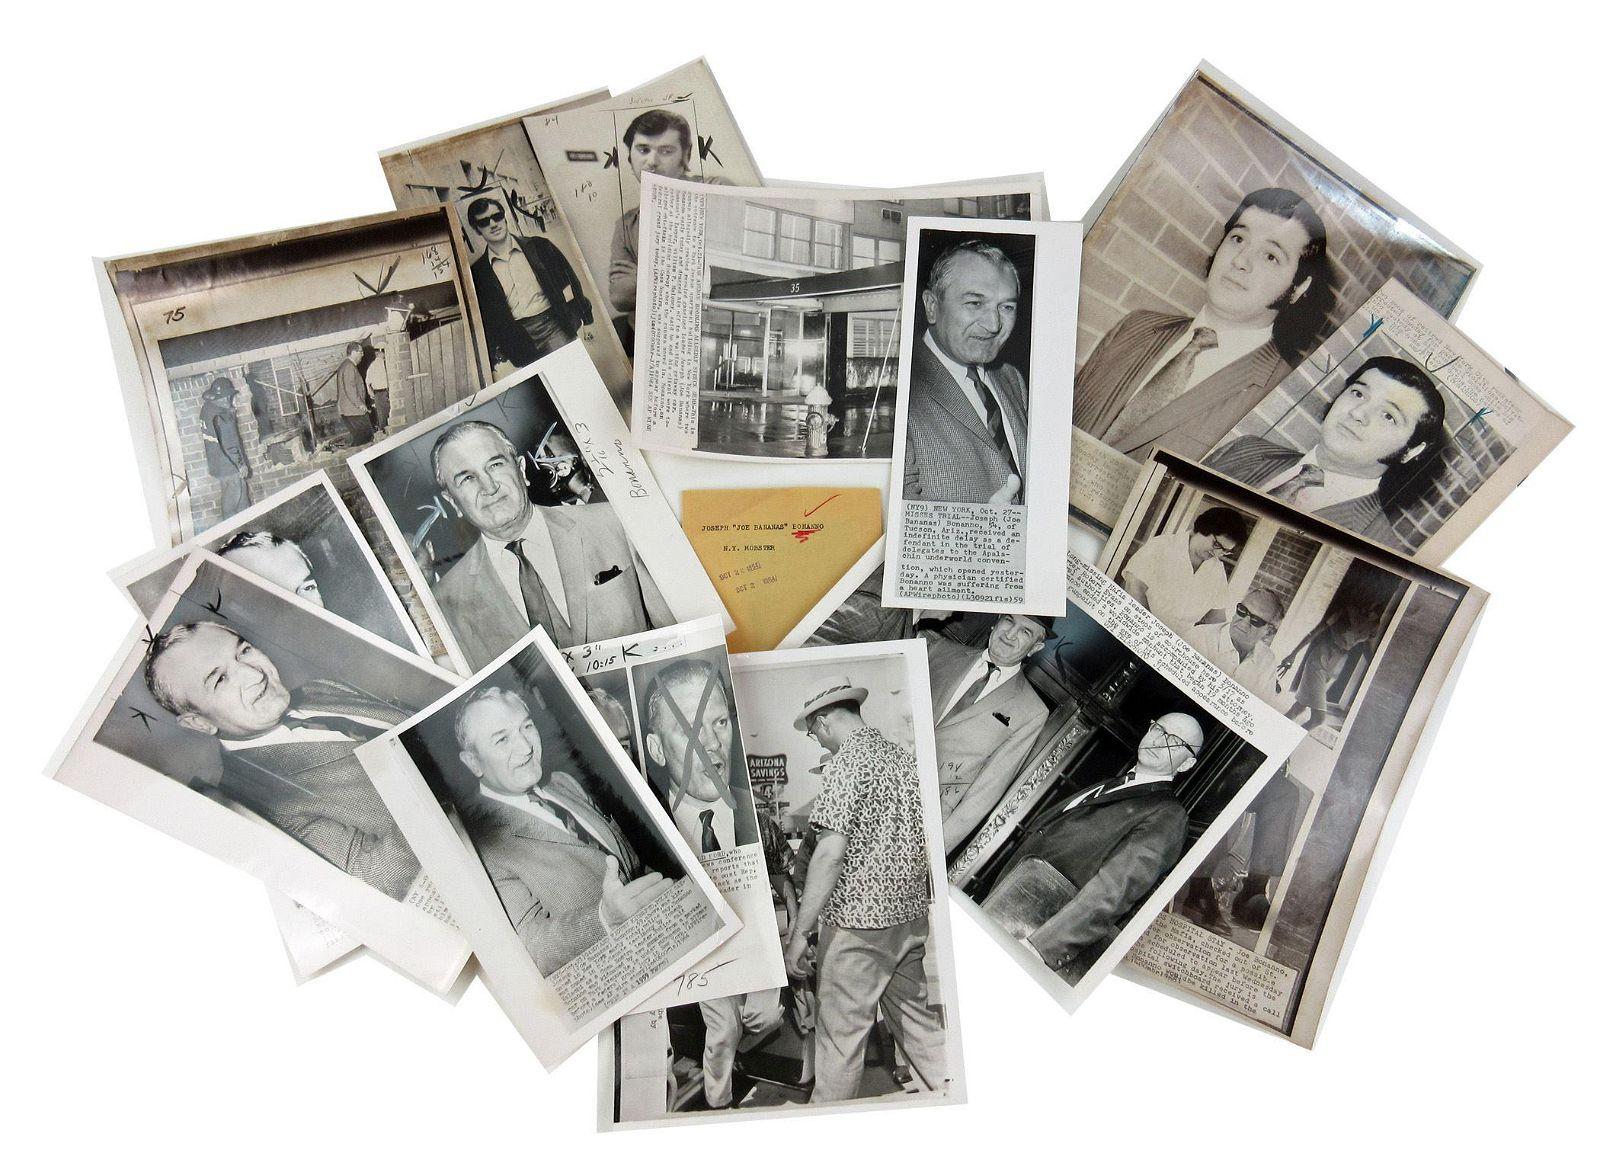 Mafia Boss Joe Bananas in Image Archive